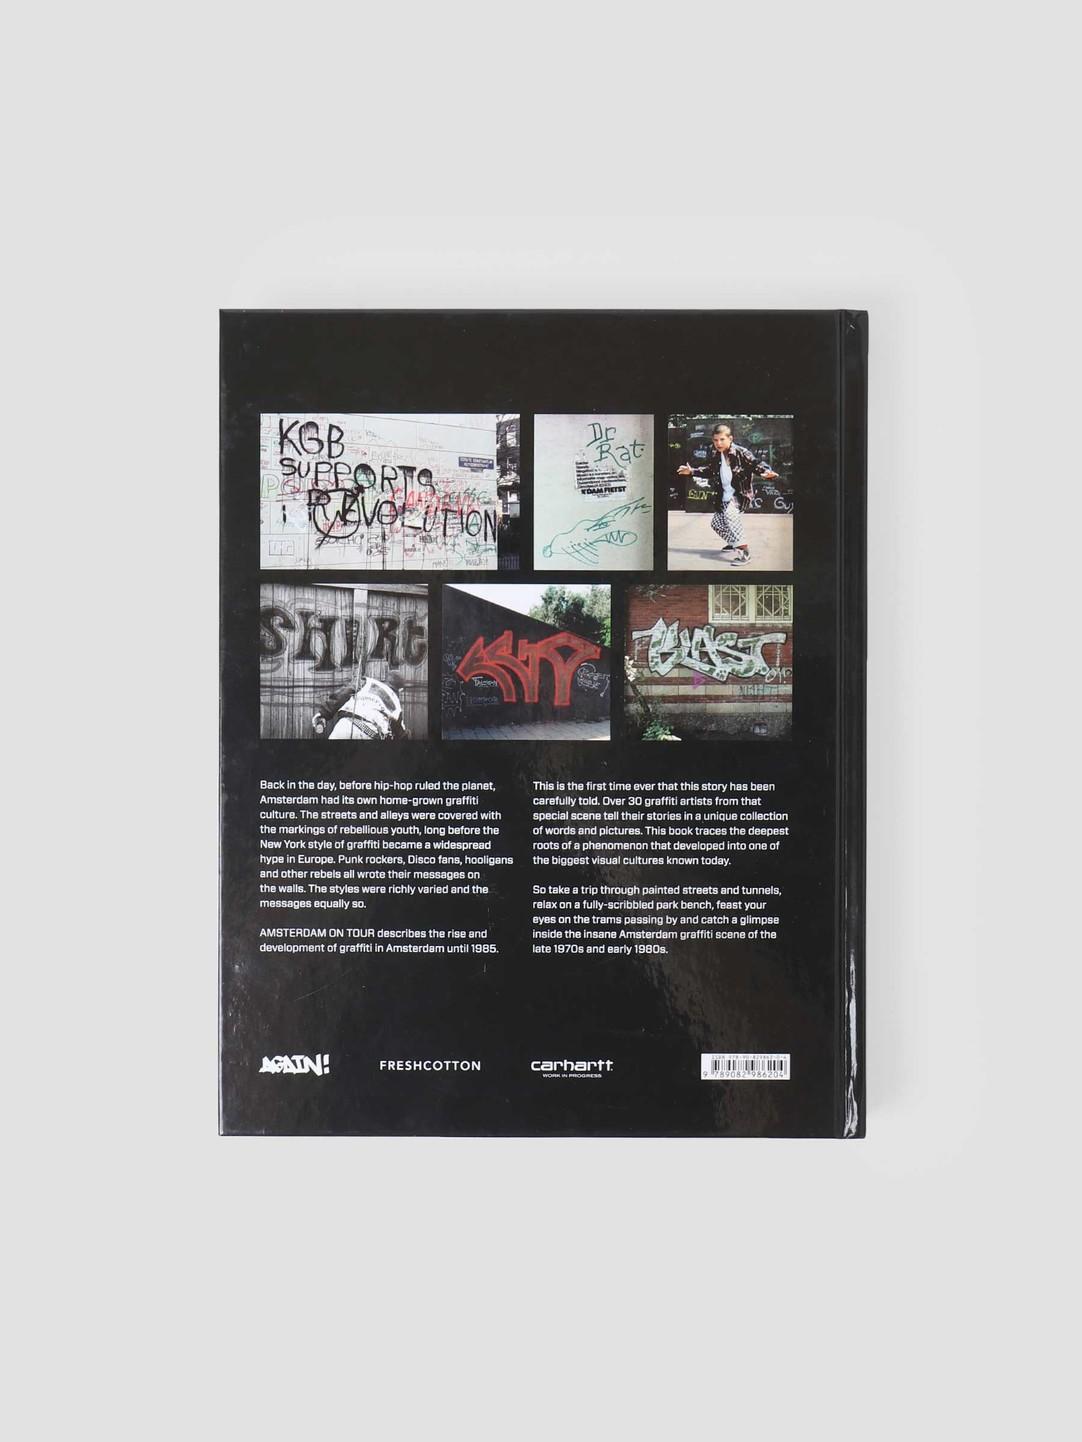 FRESHCOTTON FreshCotton x Carhartt WIP Amsterdam On Tour The Early Signs Of Dutch Graffiti 9789082986204